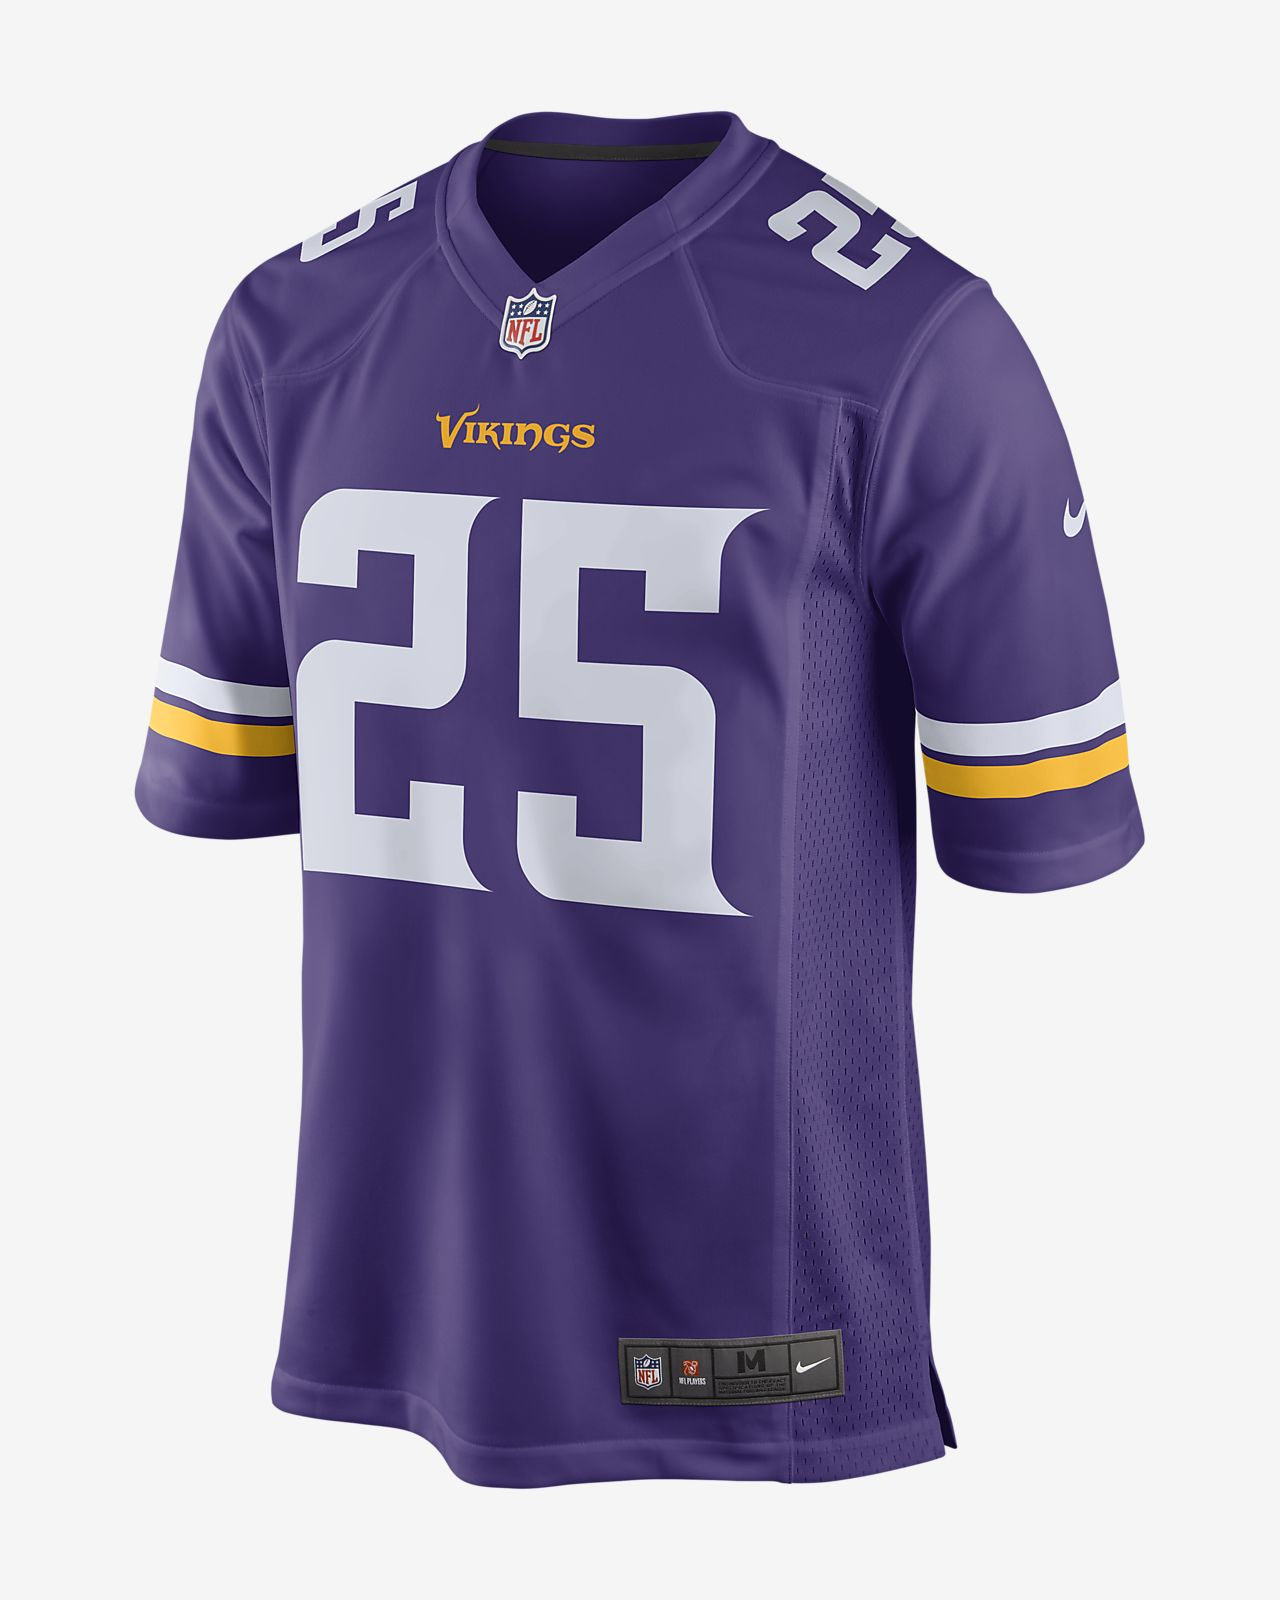 Camiseta de fútbol americano de local para hombre NFL Minnesota Vikings  (Latavius Murray) f3df40df4cf